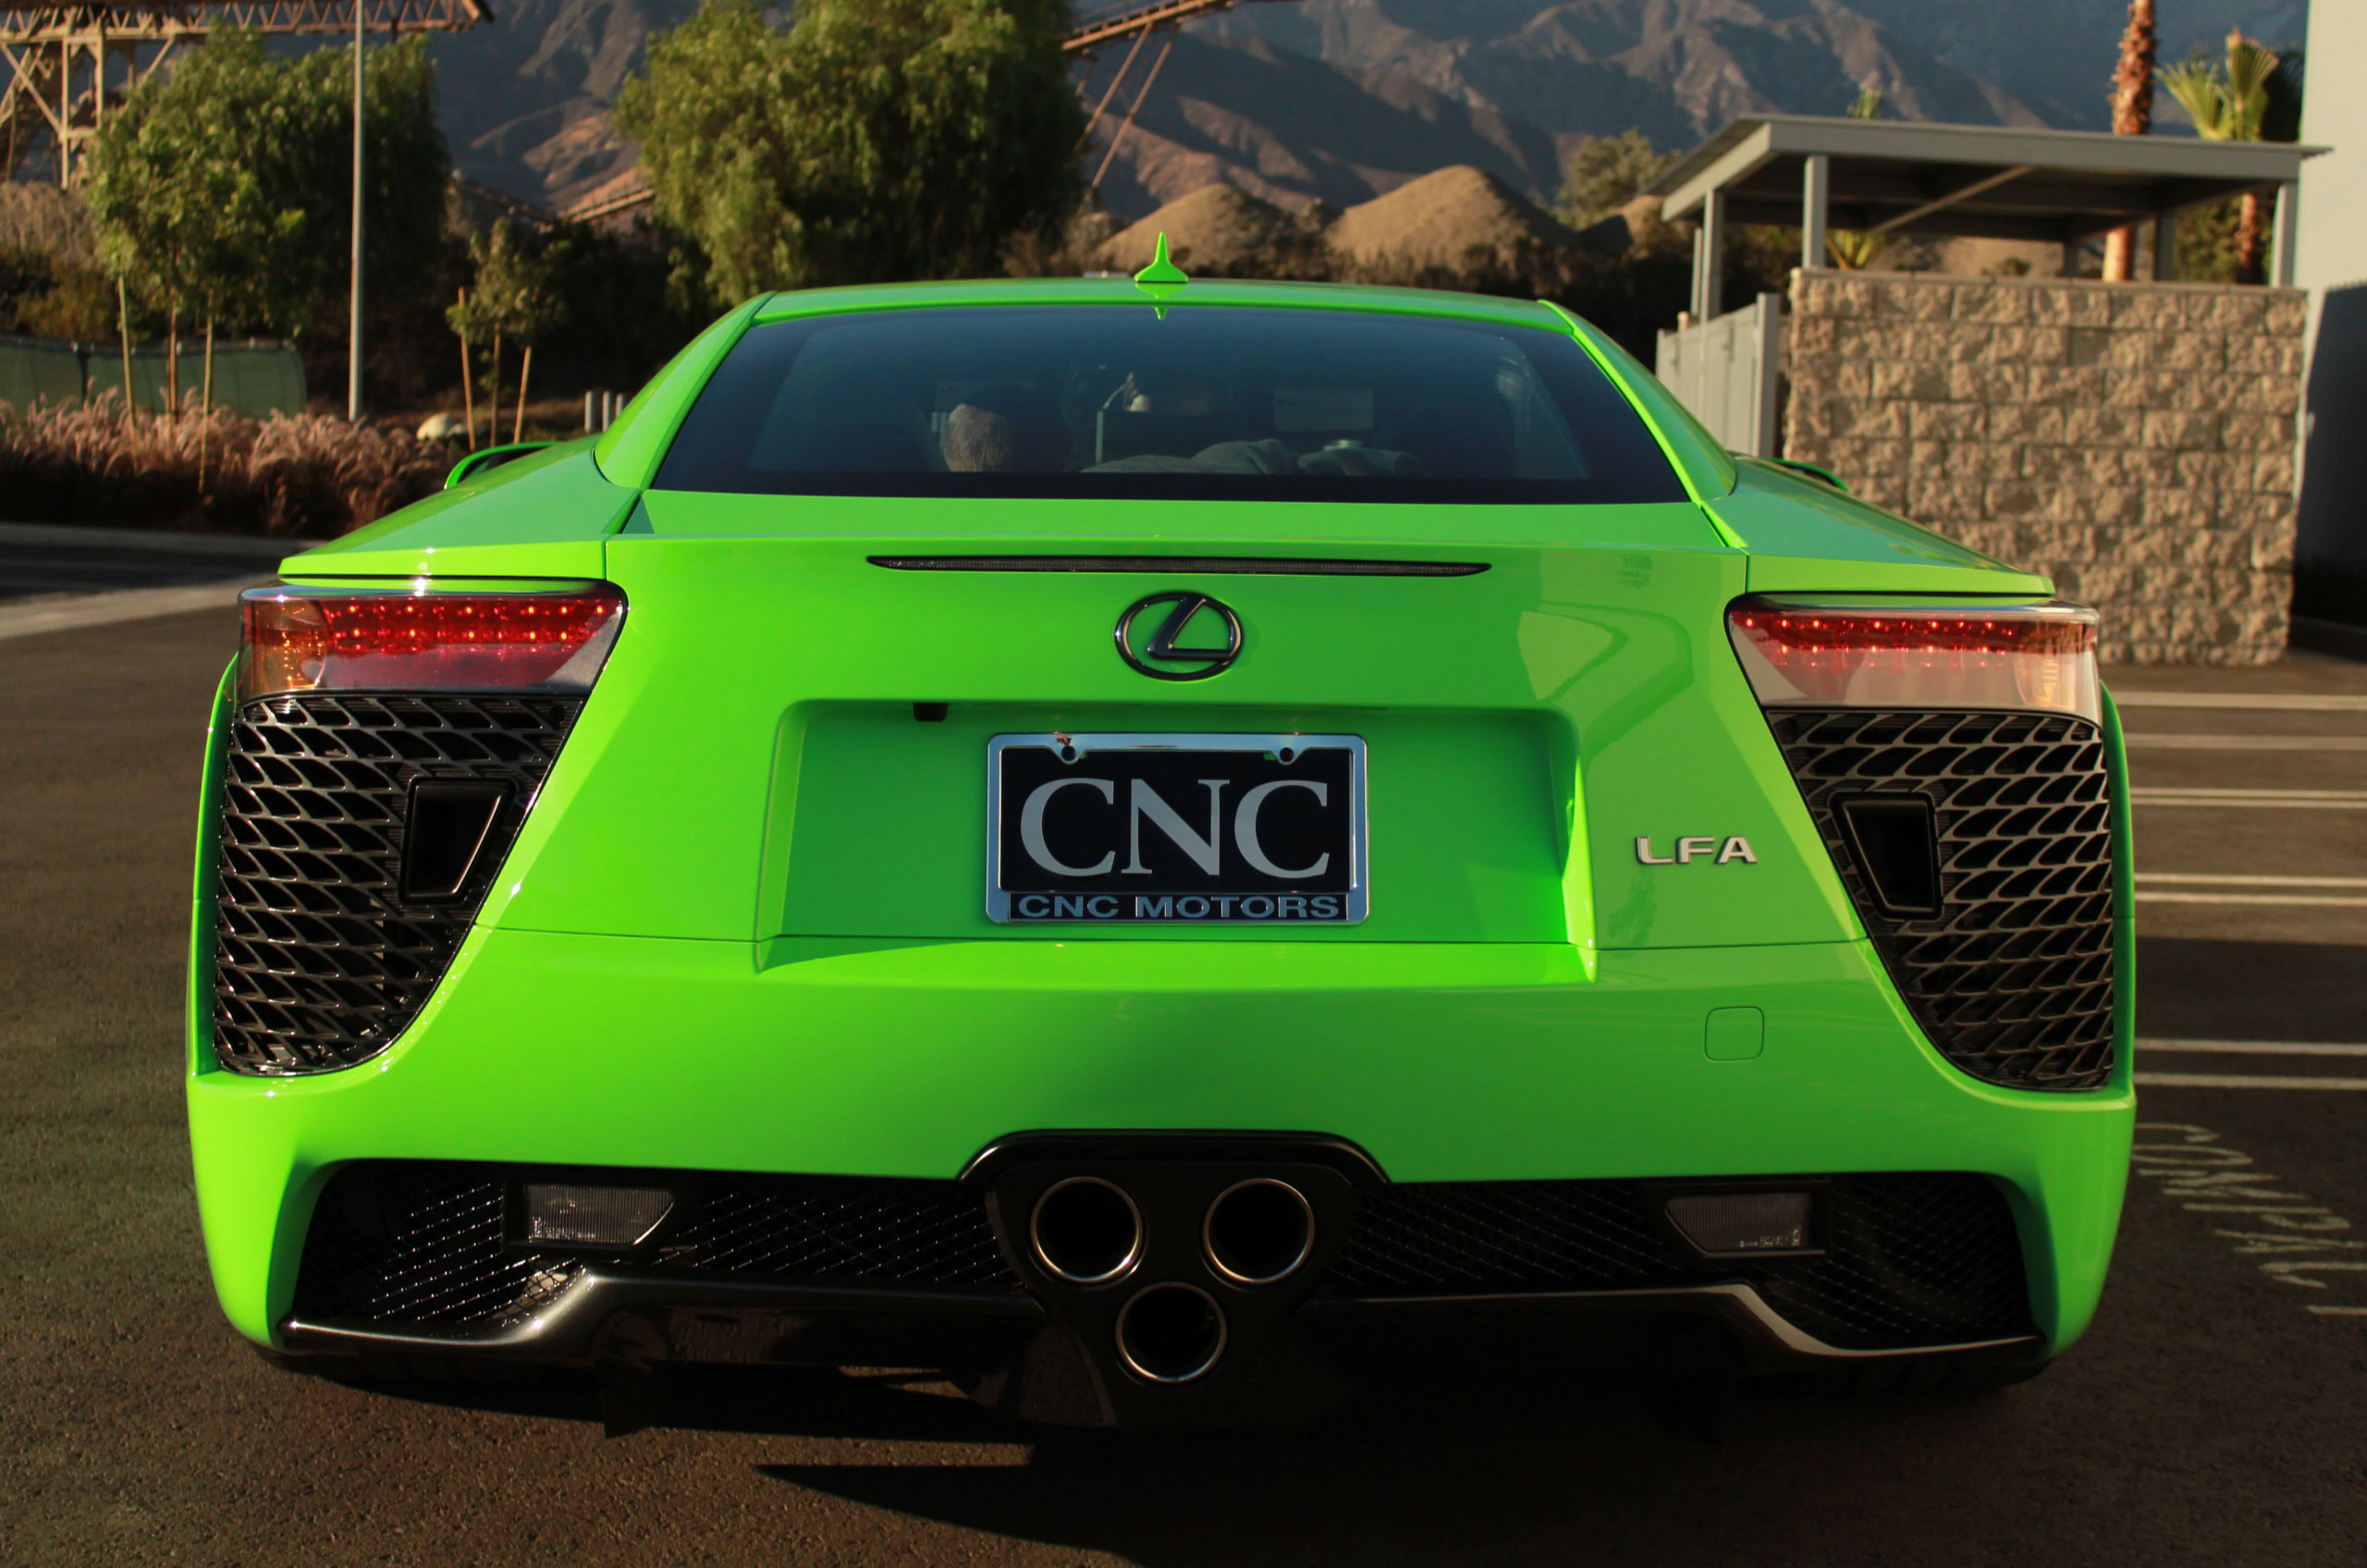 Fresh Green Lexus LFA for Sale in California